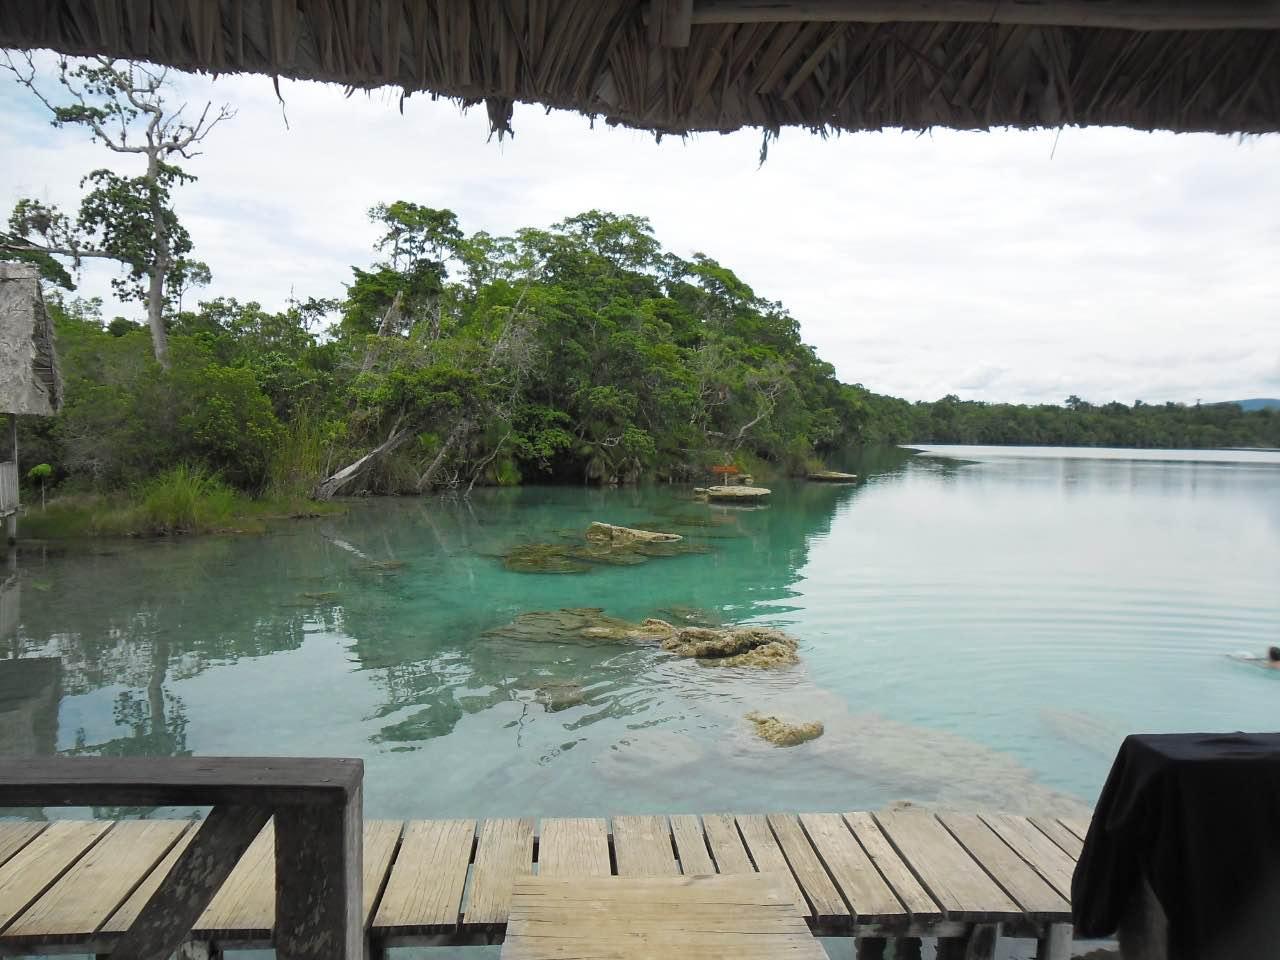 Parque Nacional Laguna Lachuá, Guatemala